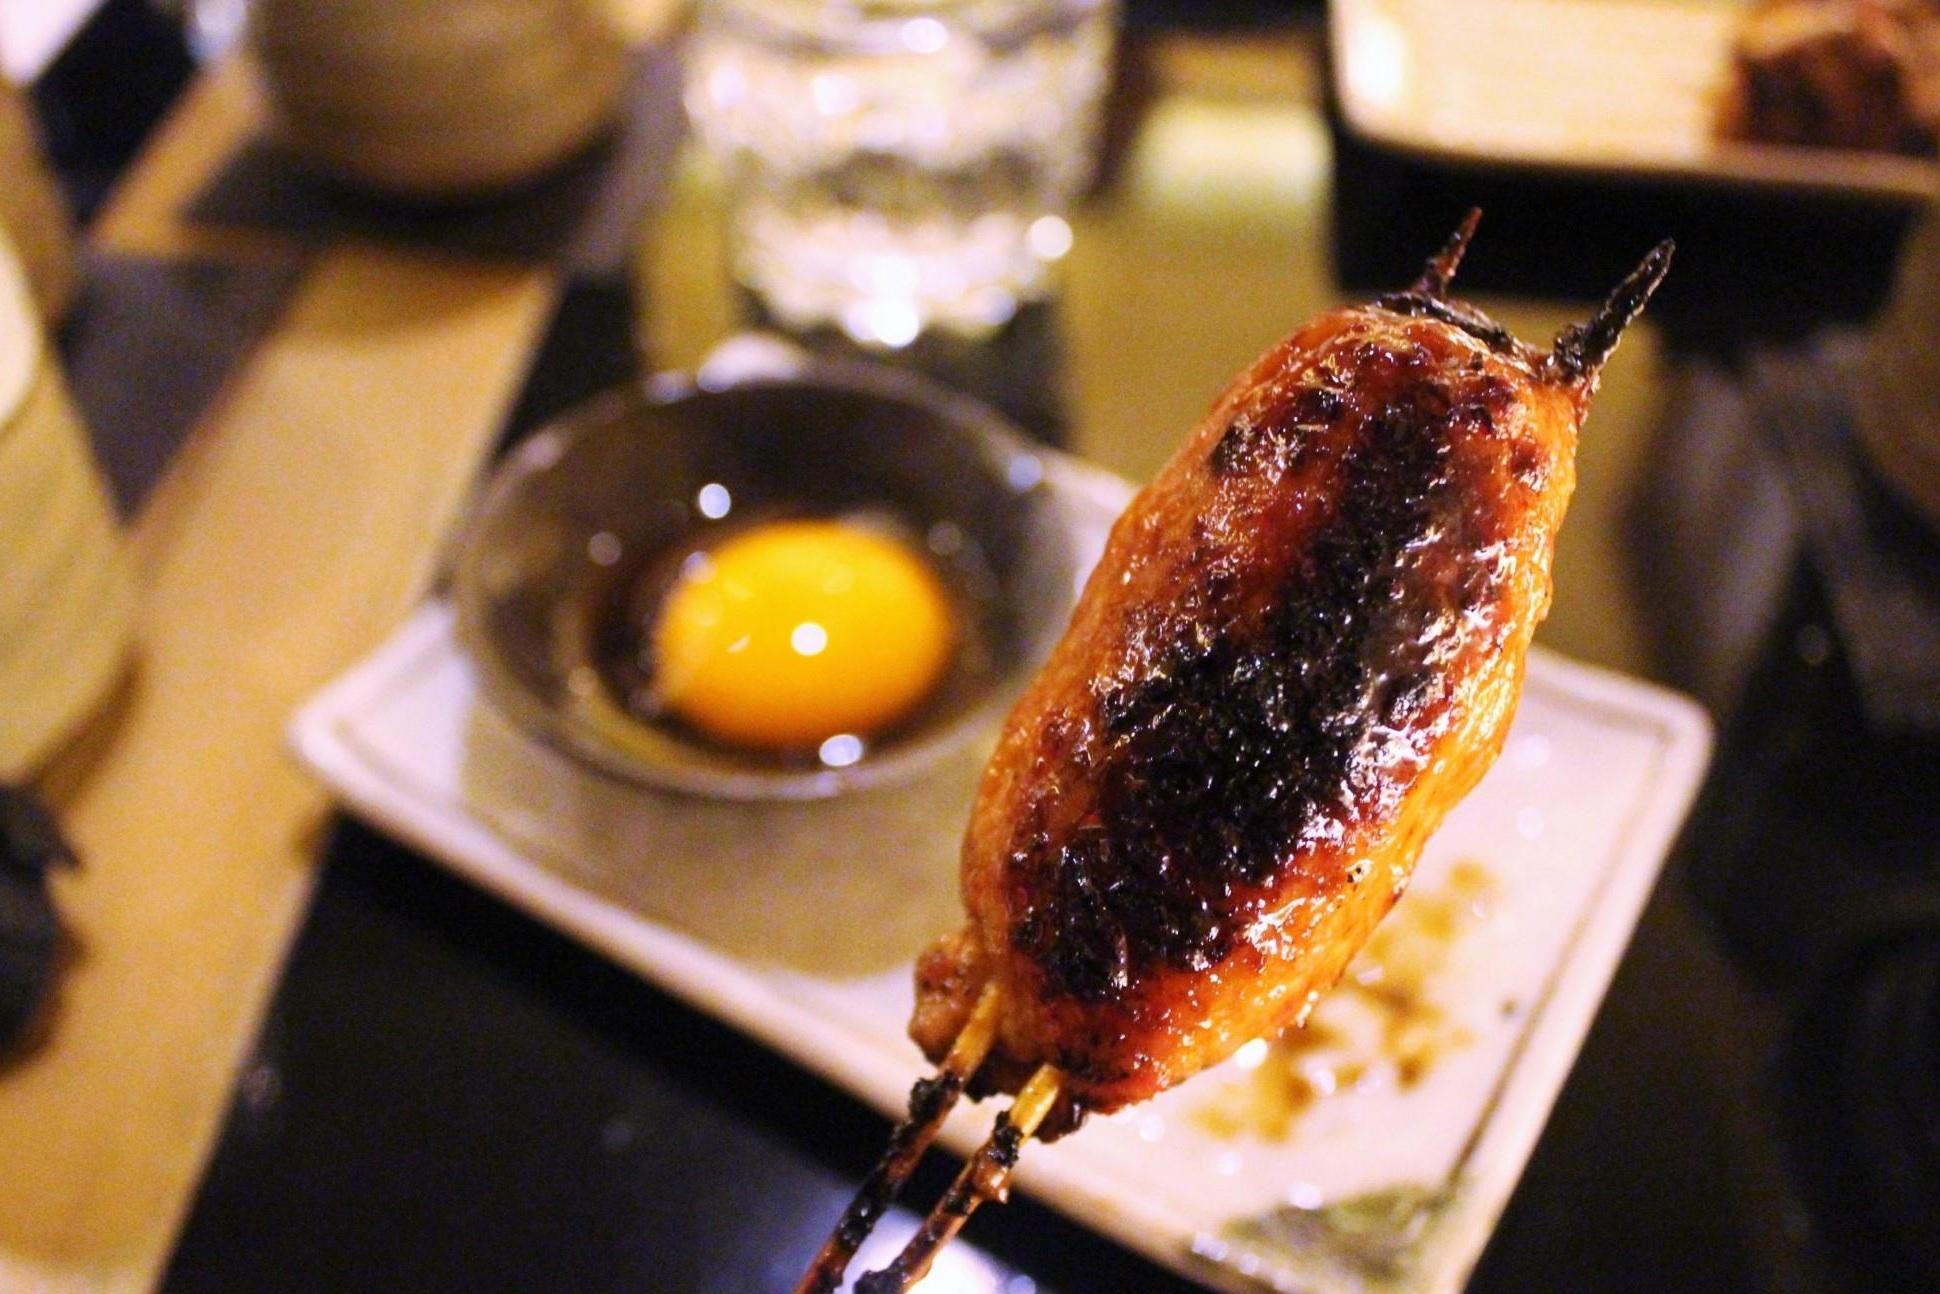 Chicken Meatball with Yolk